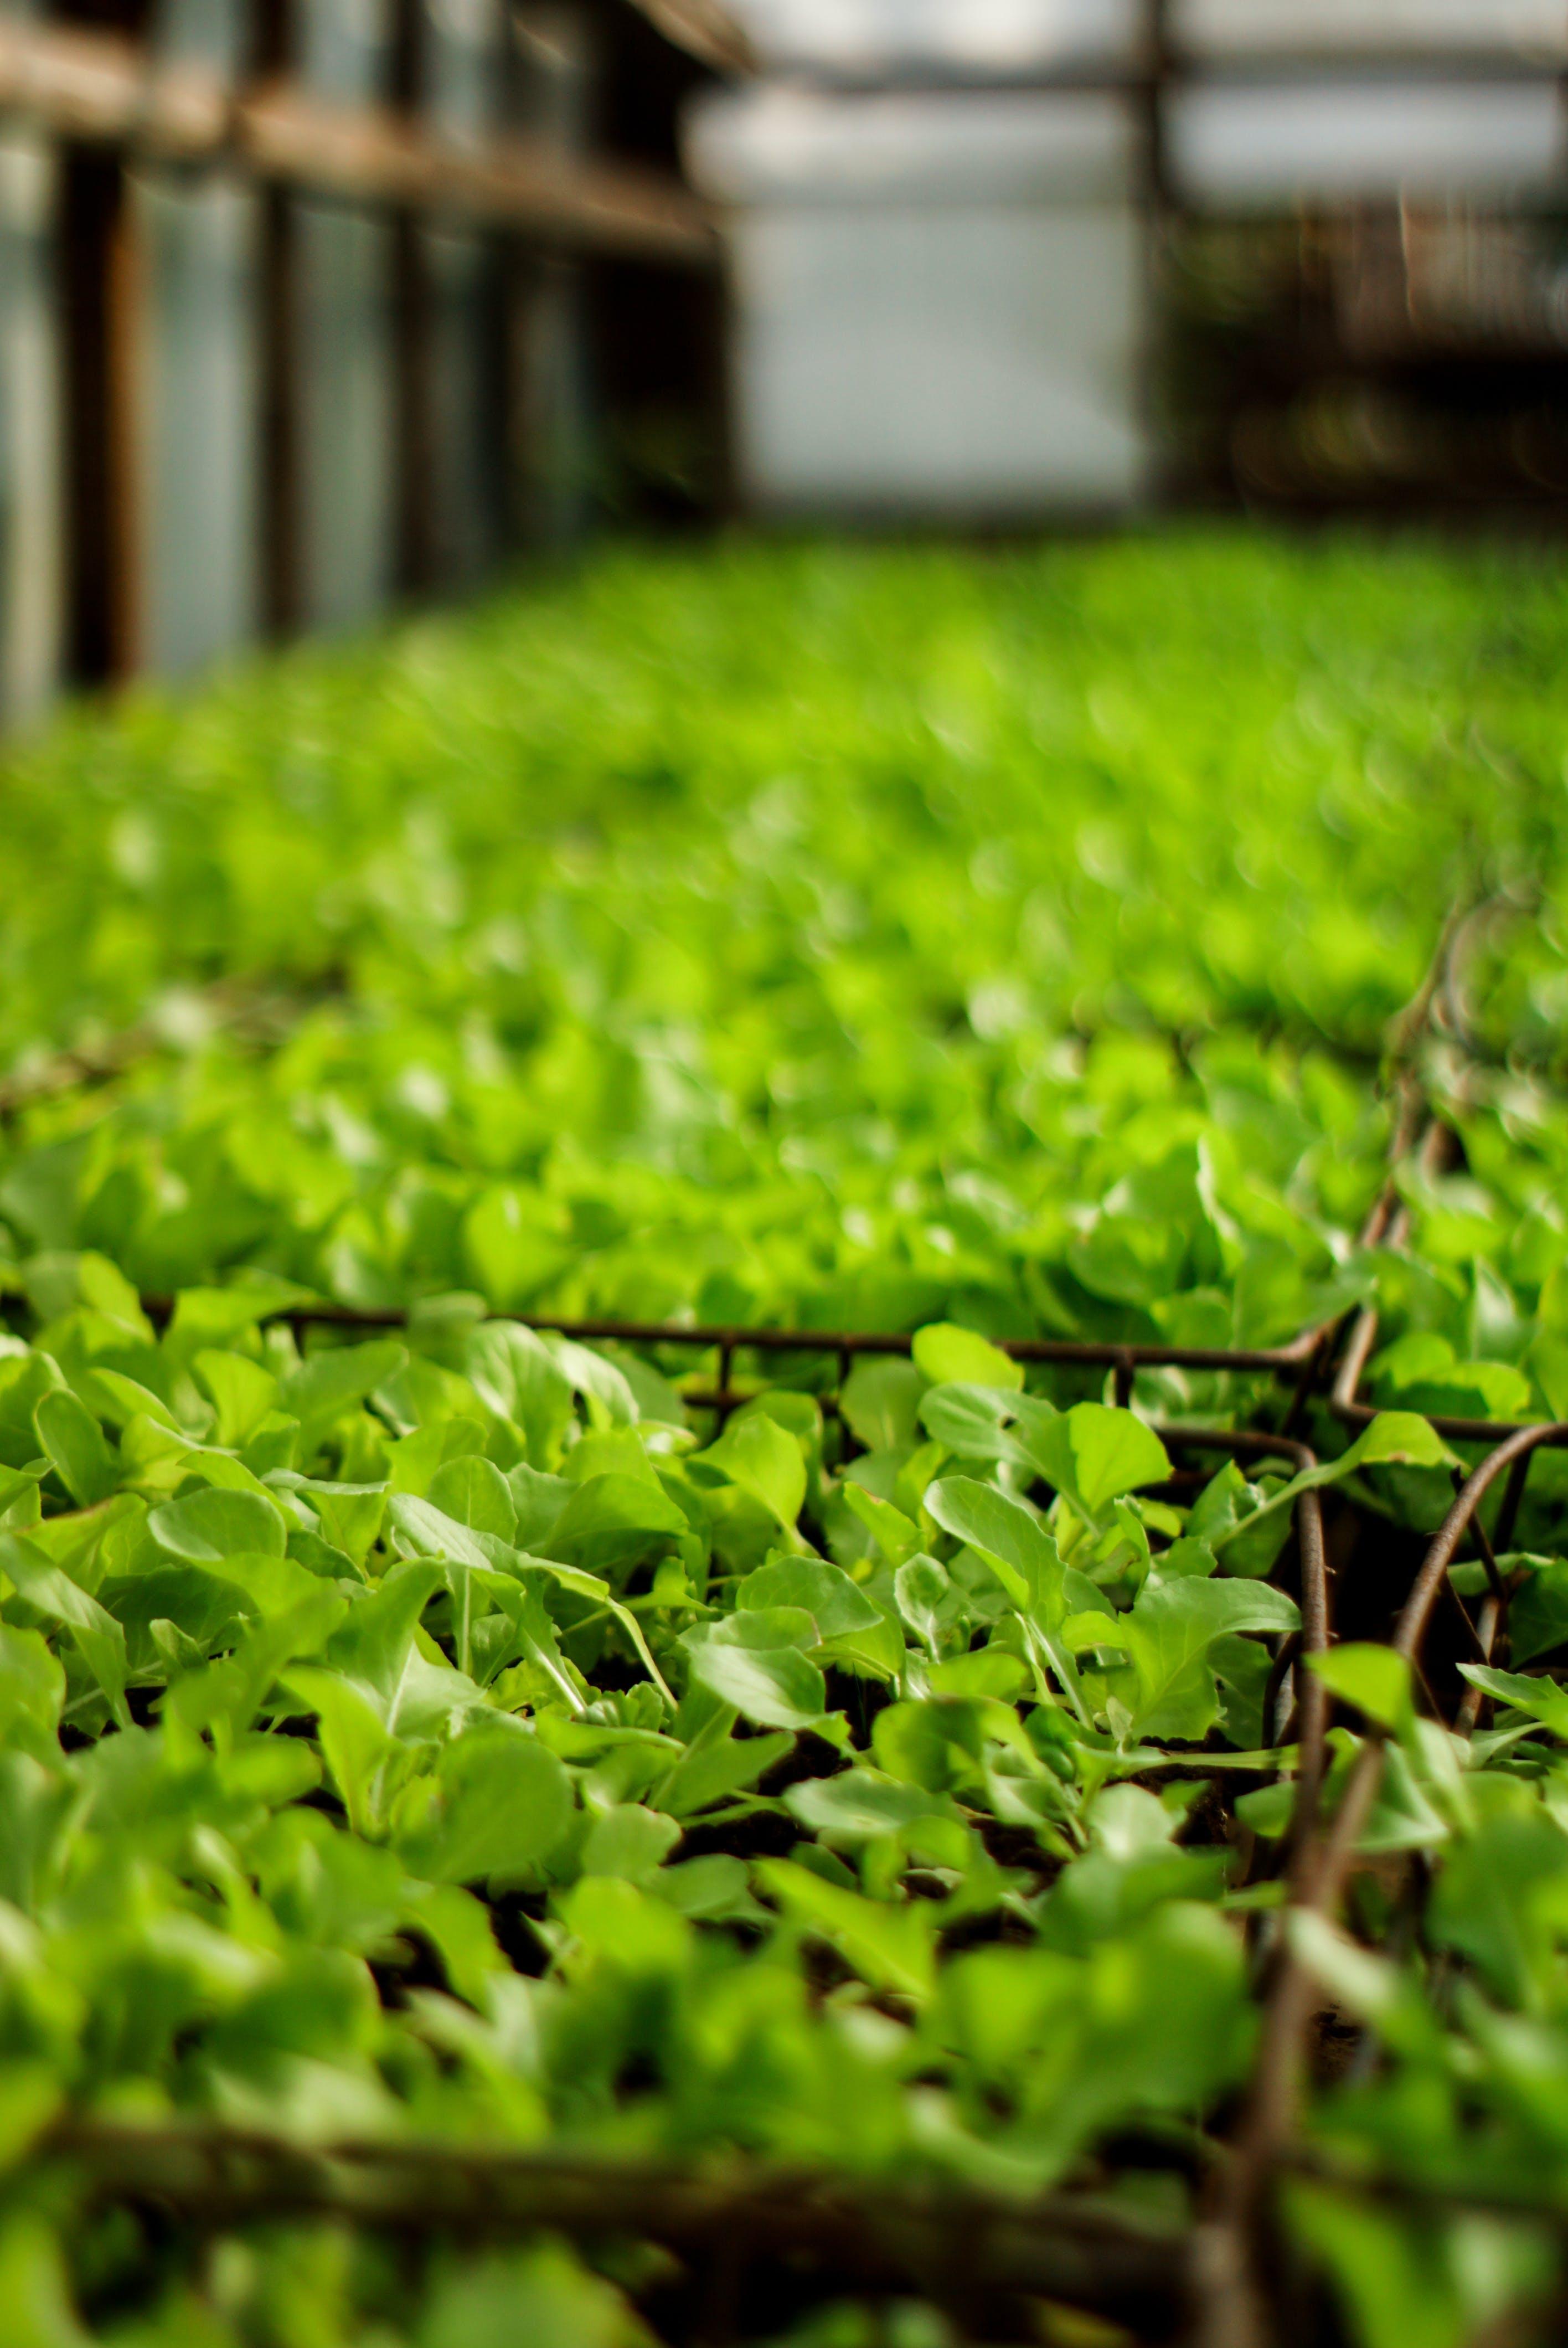 Kostenloses Stock Foto zu dunkelgrüne pflanzen, gartenarbeit, grüner salat, pflanzen